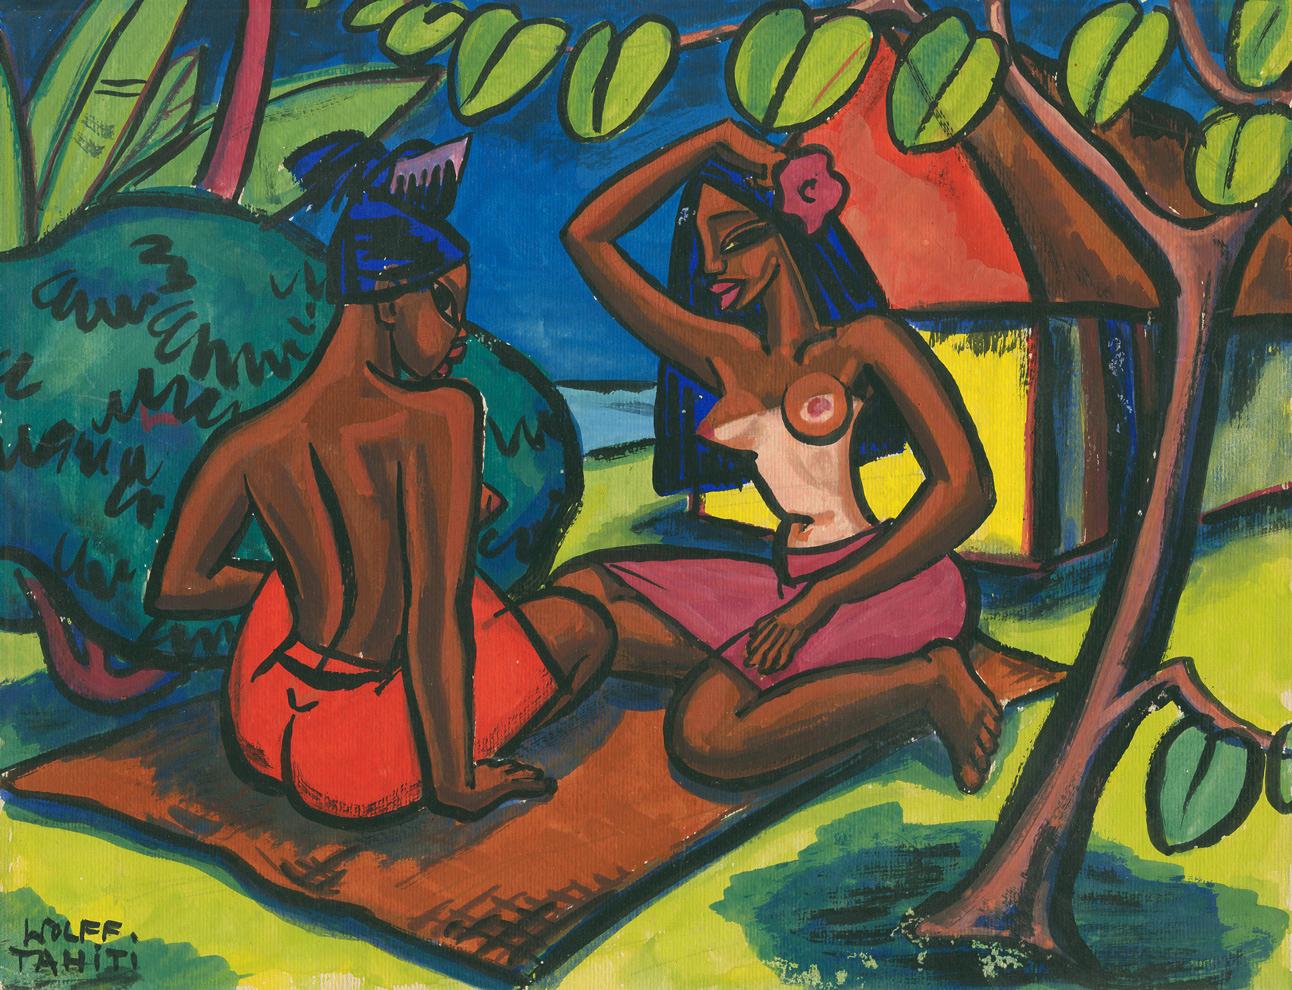 Vahine Tahiti, gouache on paper, no date, 10,5 x 13,5 inches